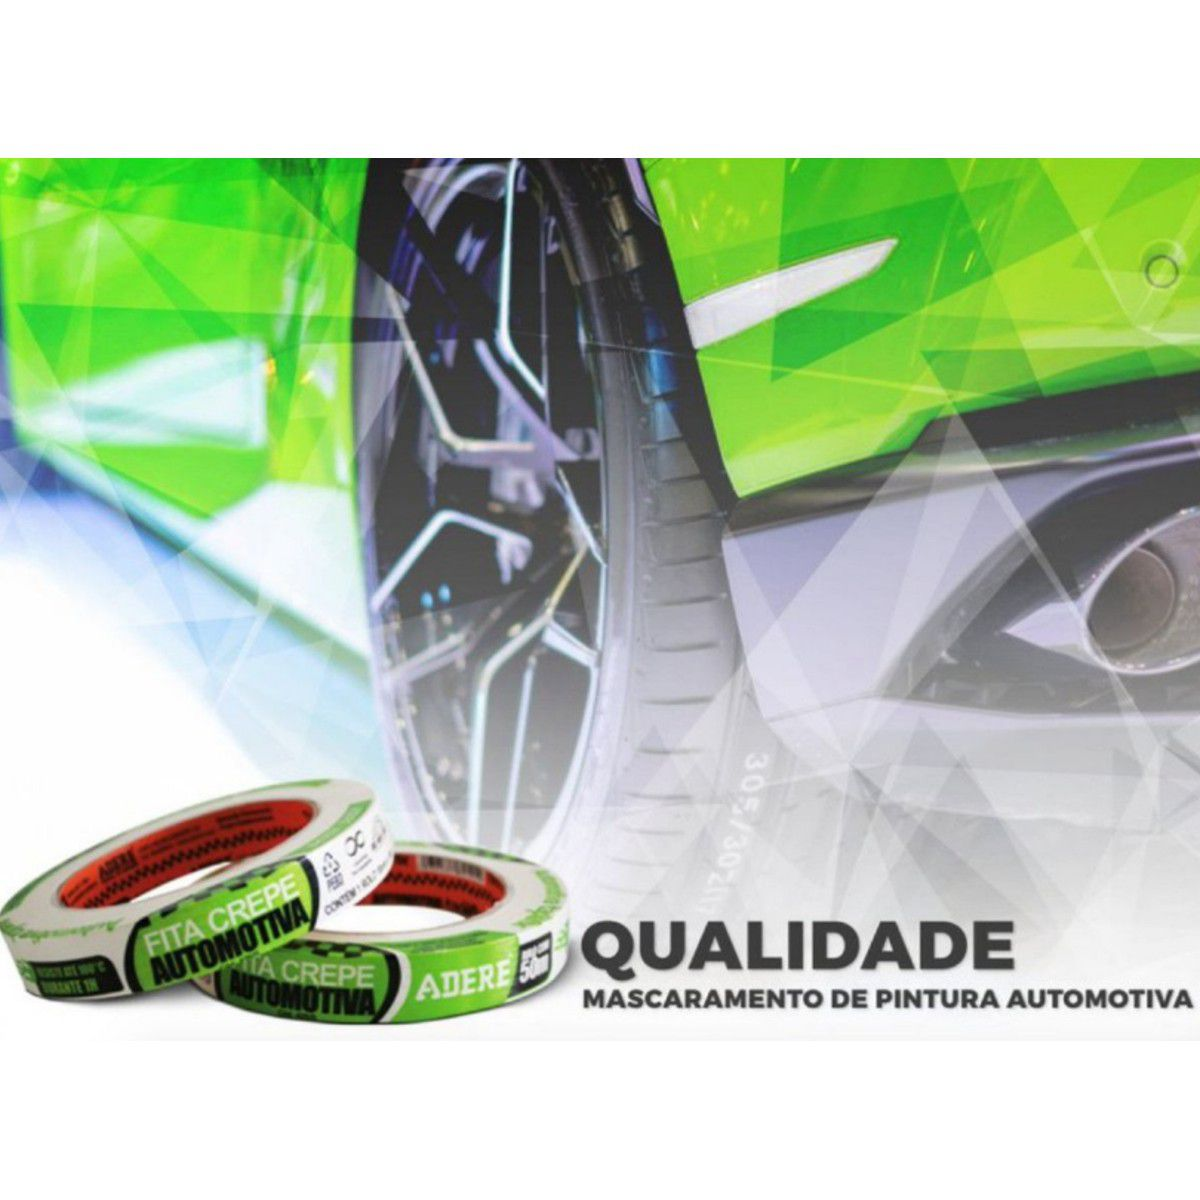 Fita Crepe Automotiva 18mmx50m Adere (profissional)